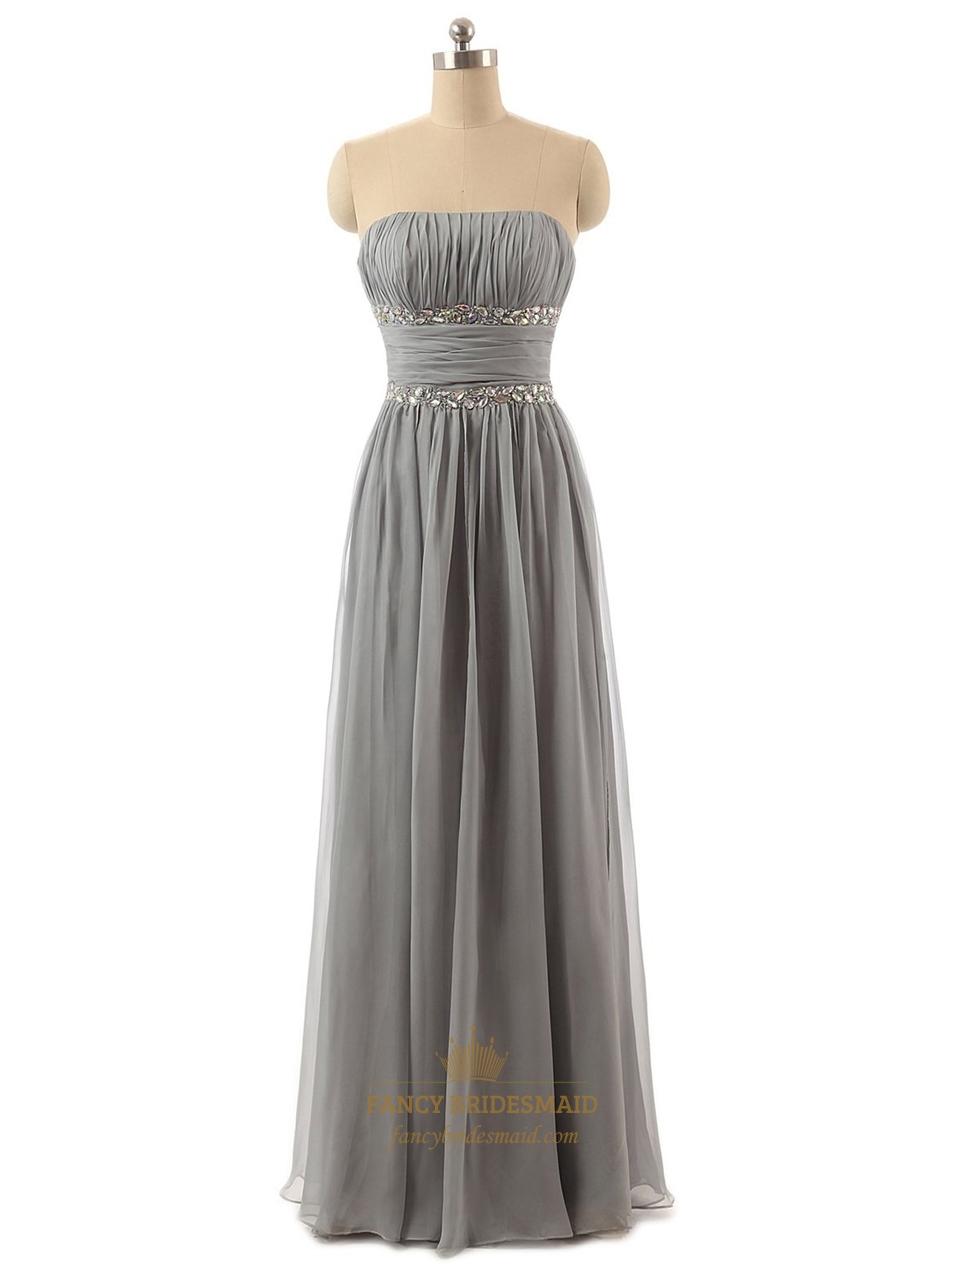 casual gray dress photo - 1